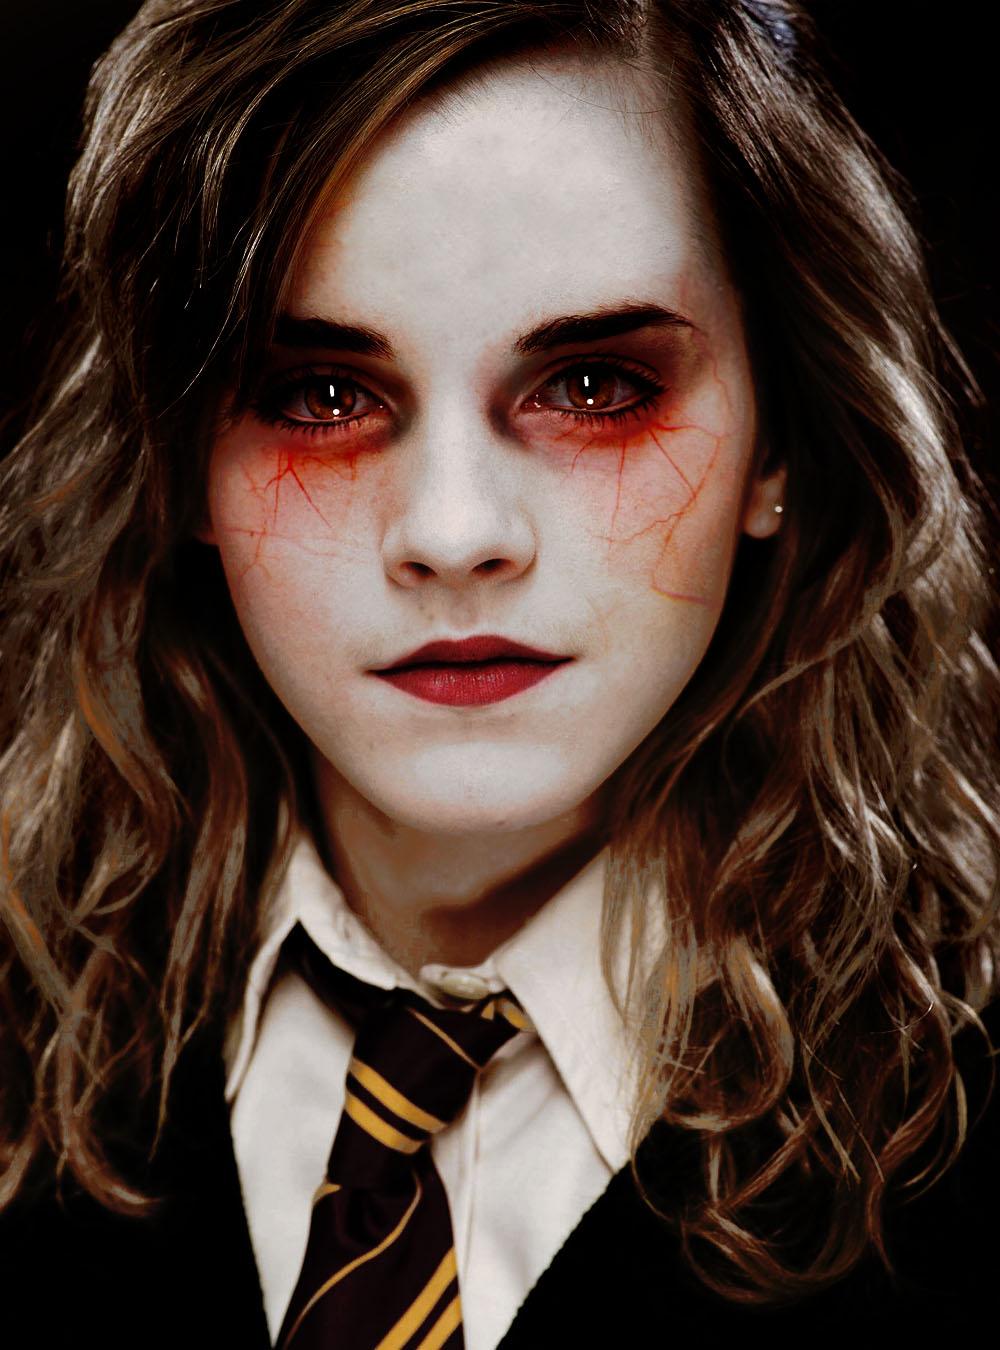 hermione foto: